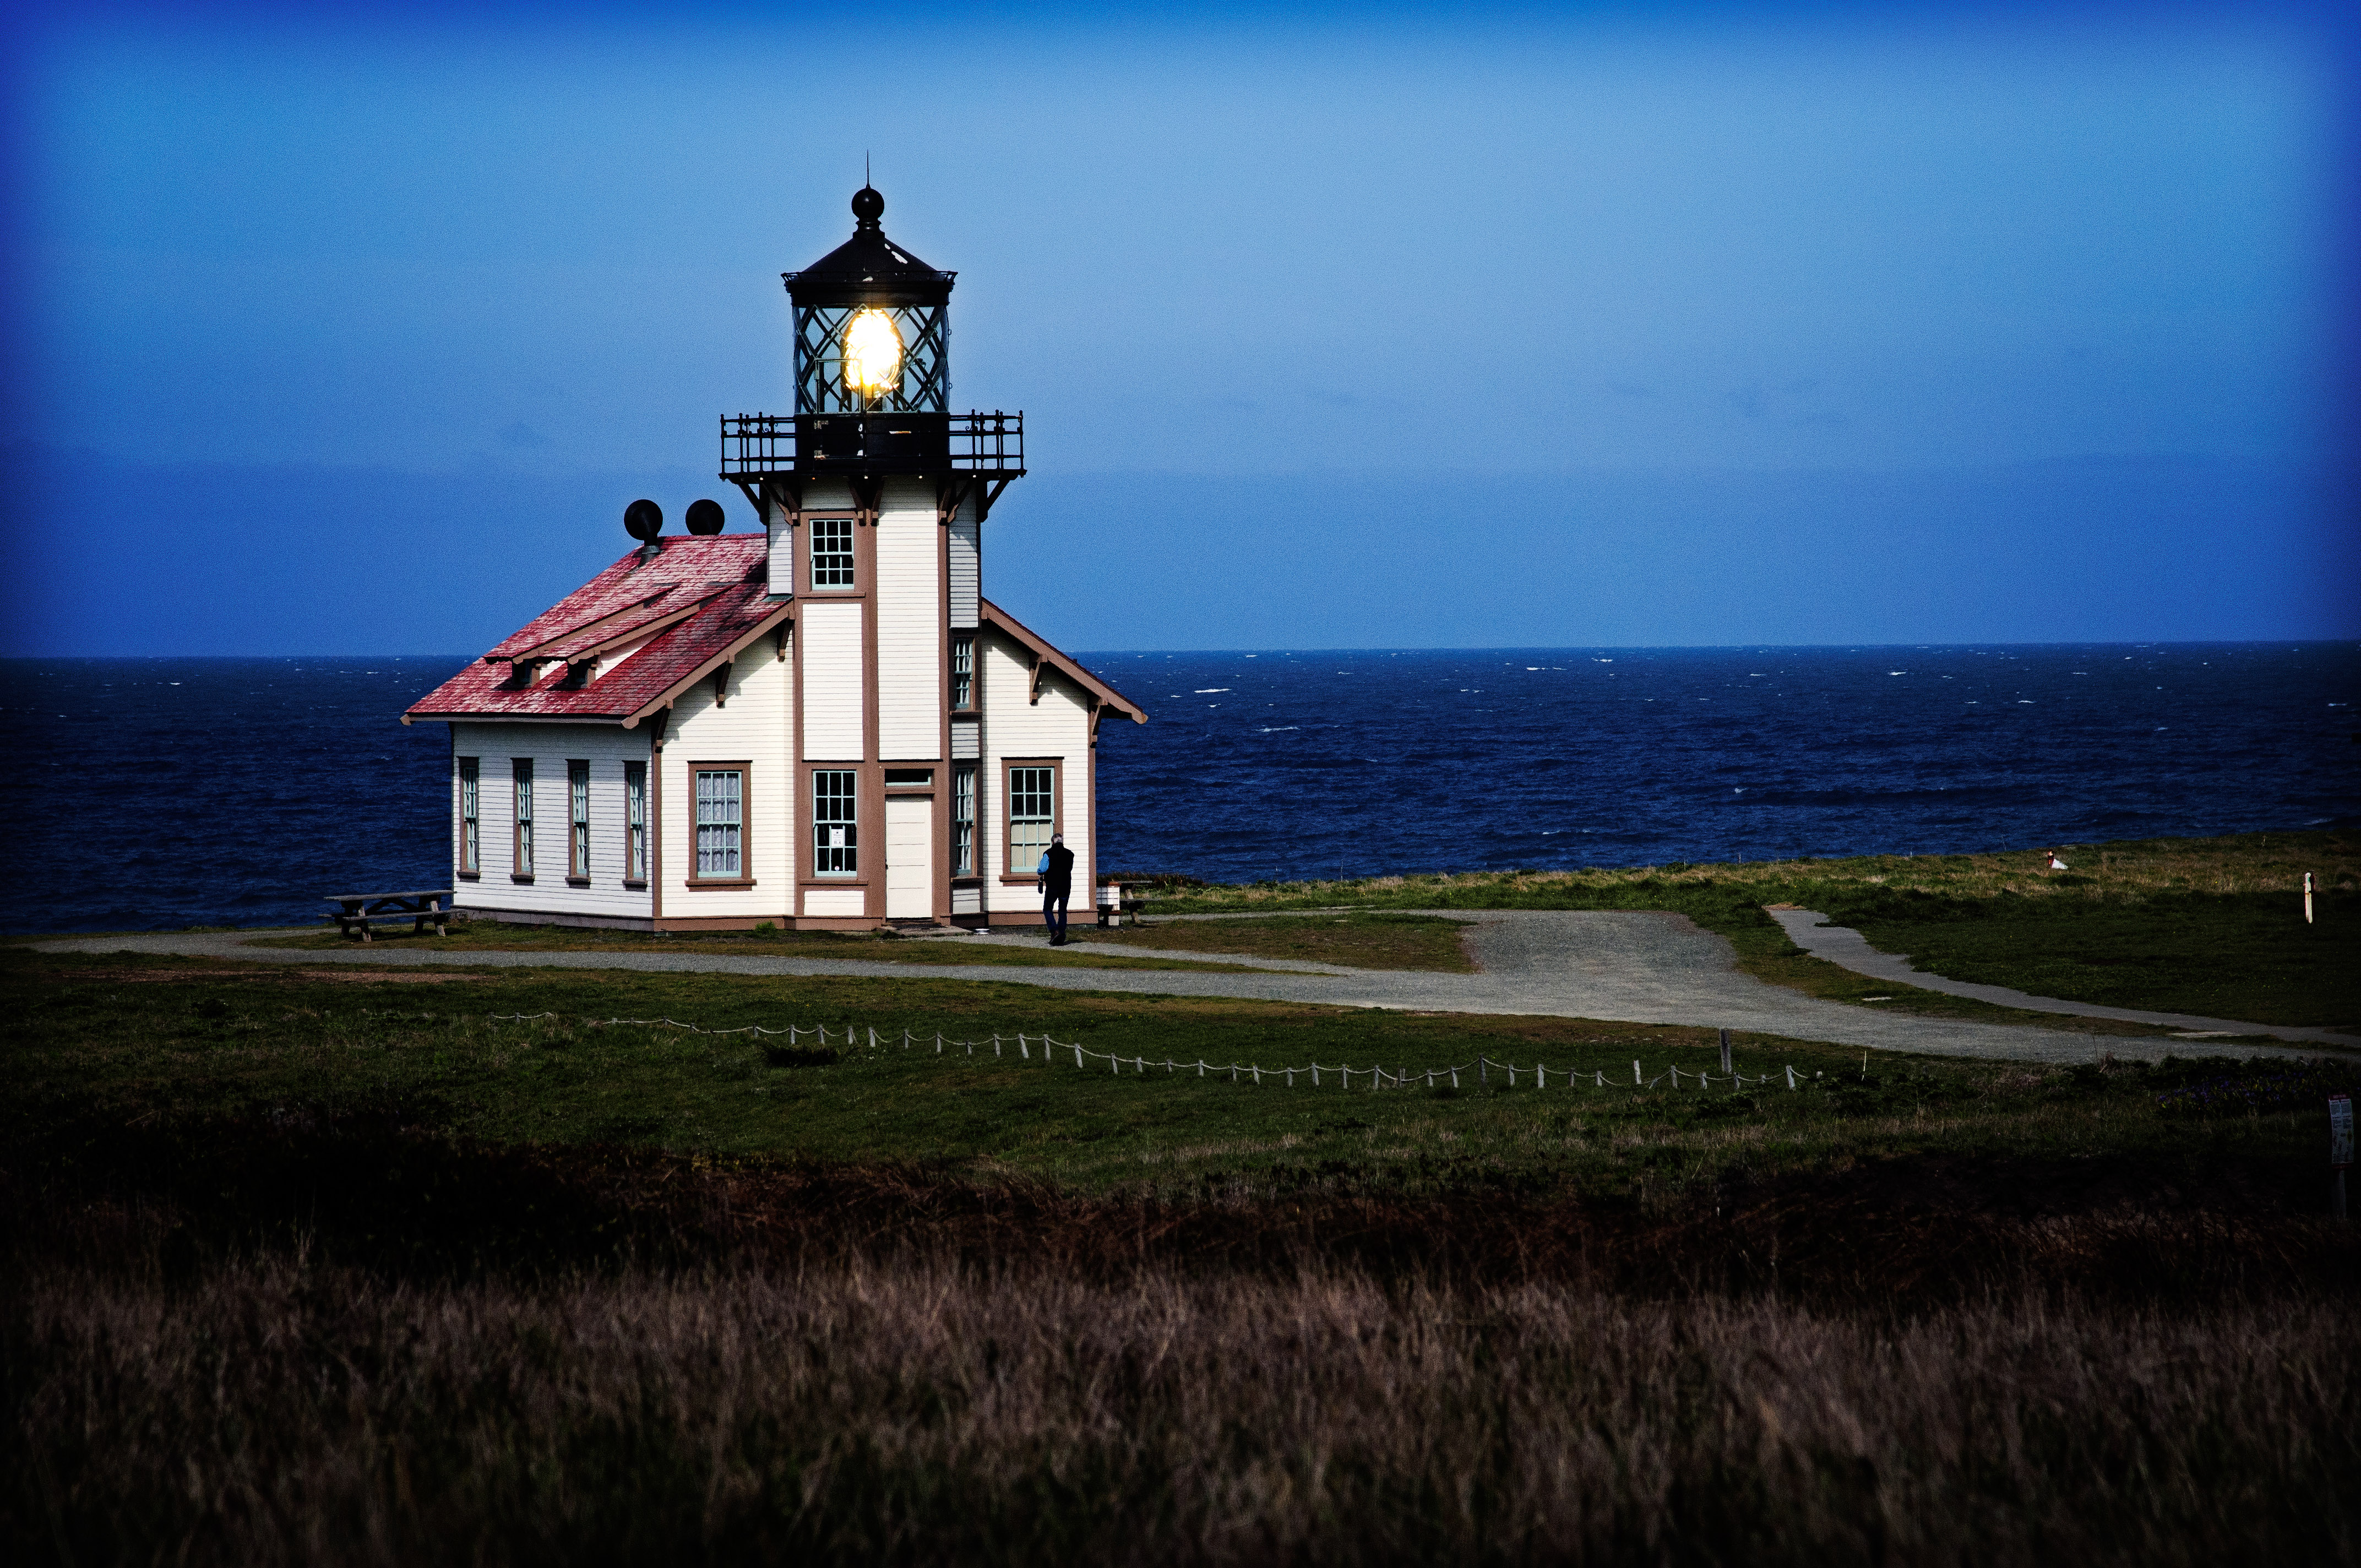 Lighthouse keeper arrives.